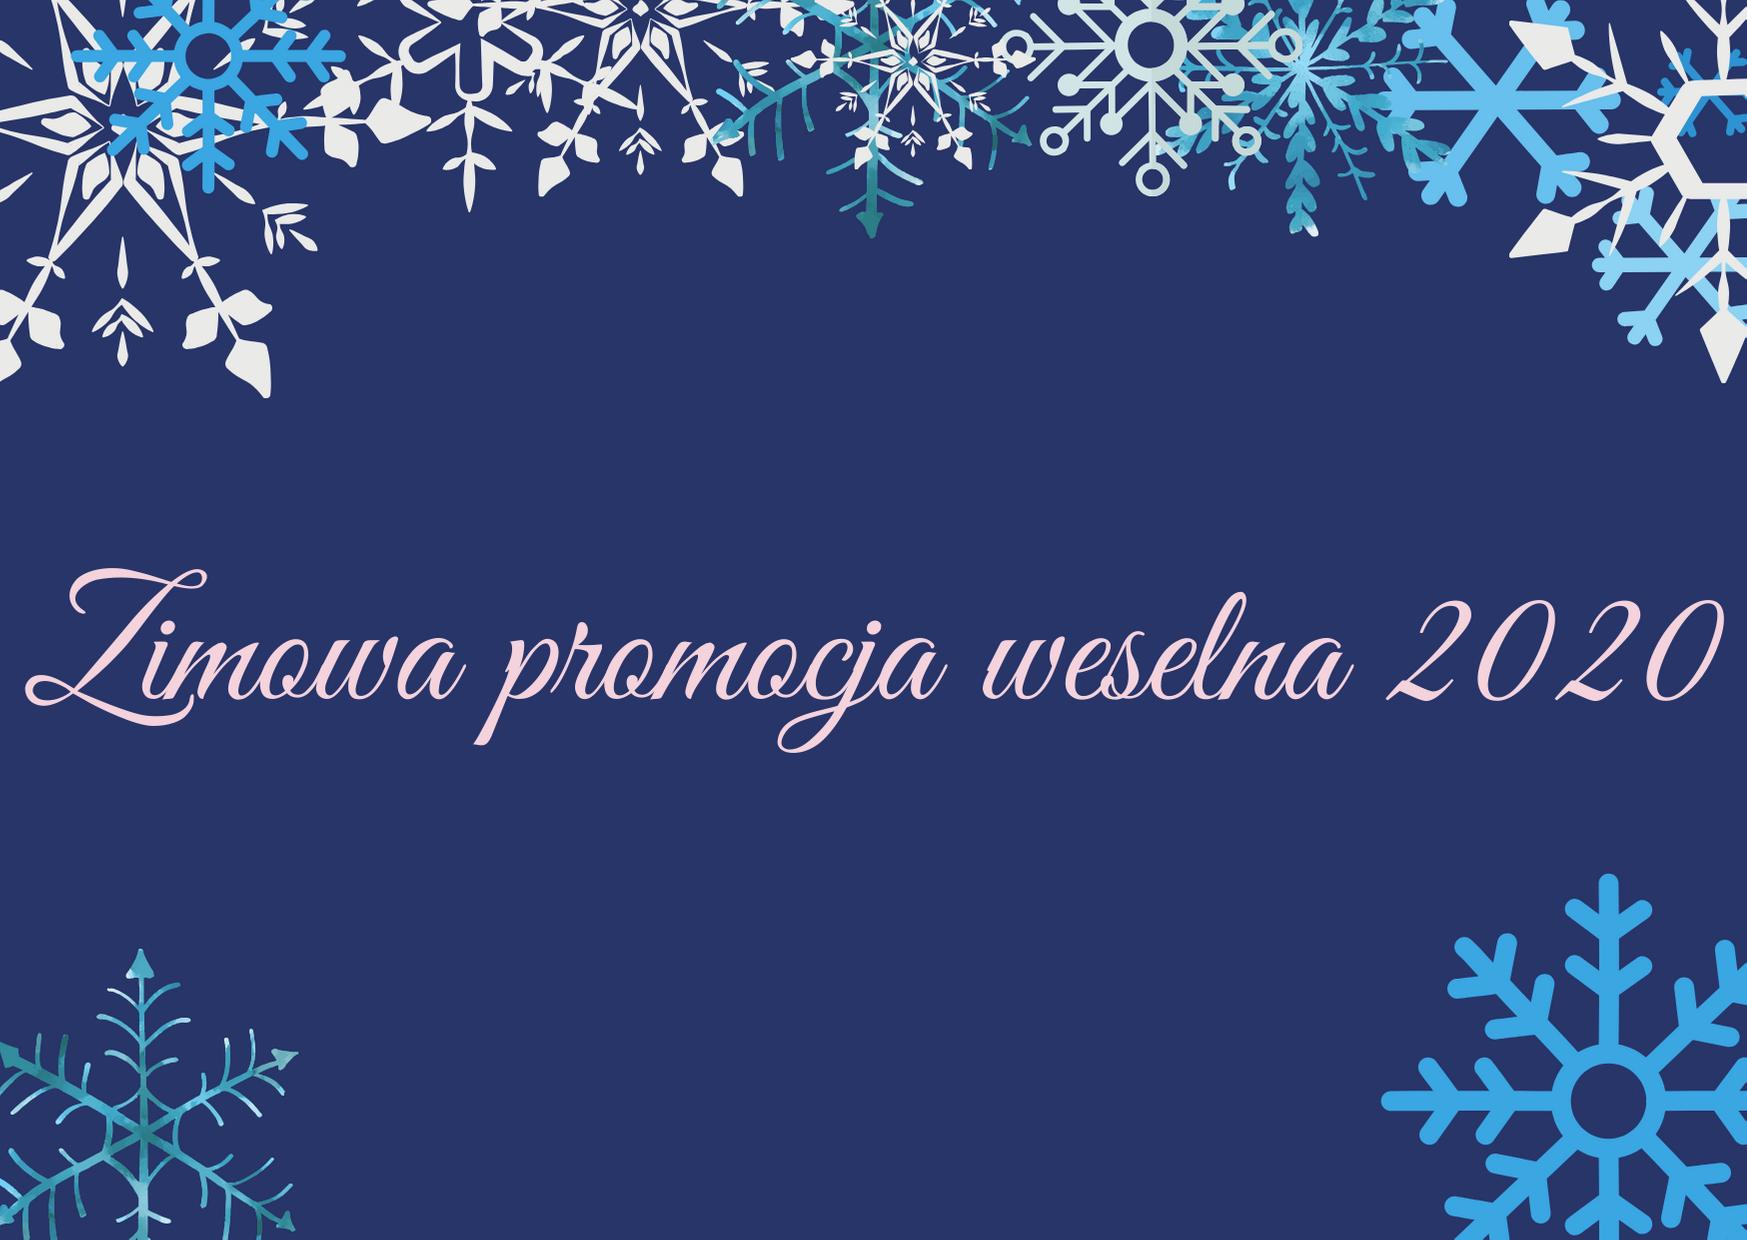 Zimowa promocja weselna 2020